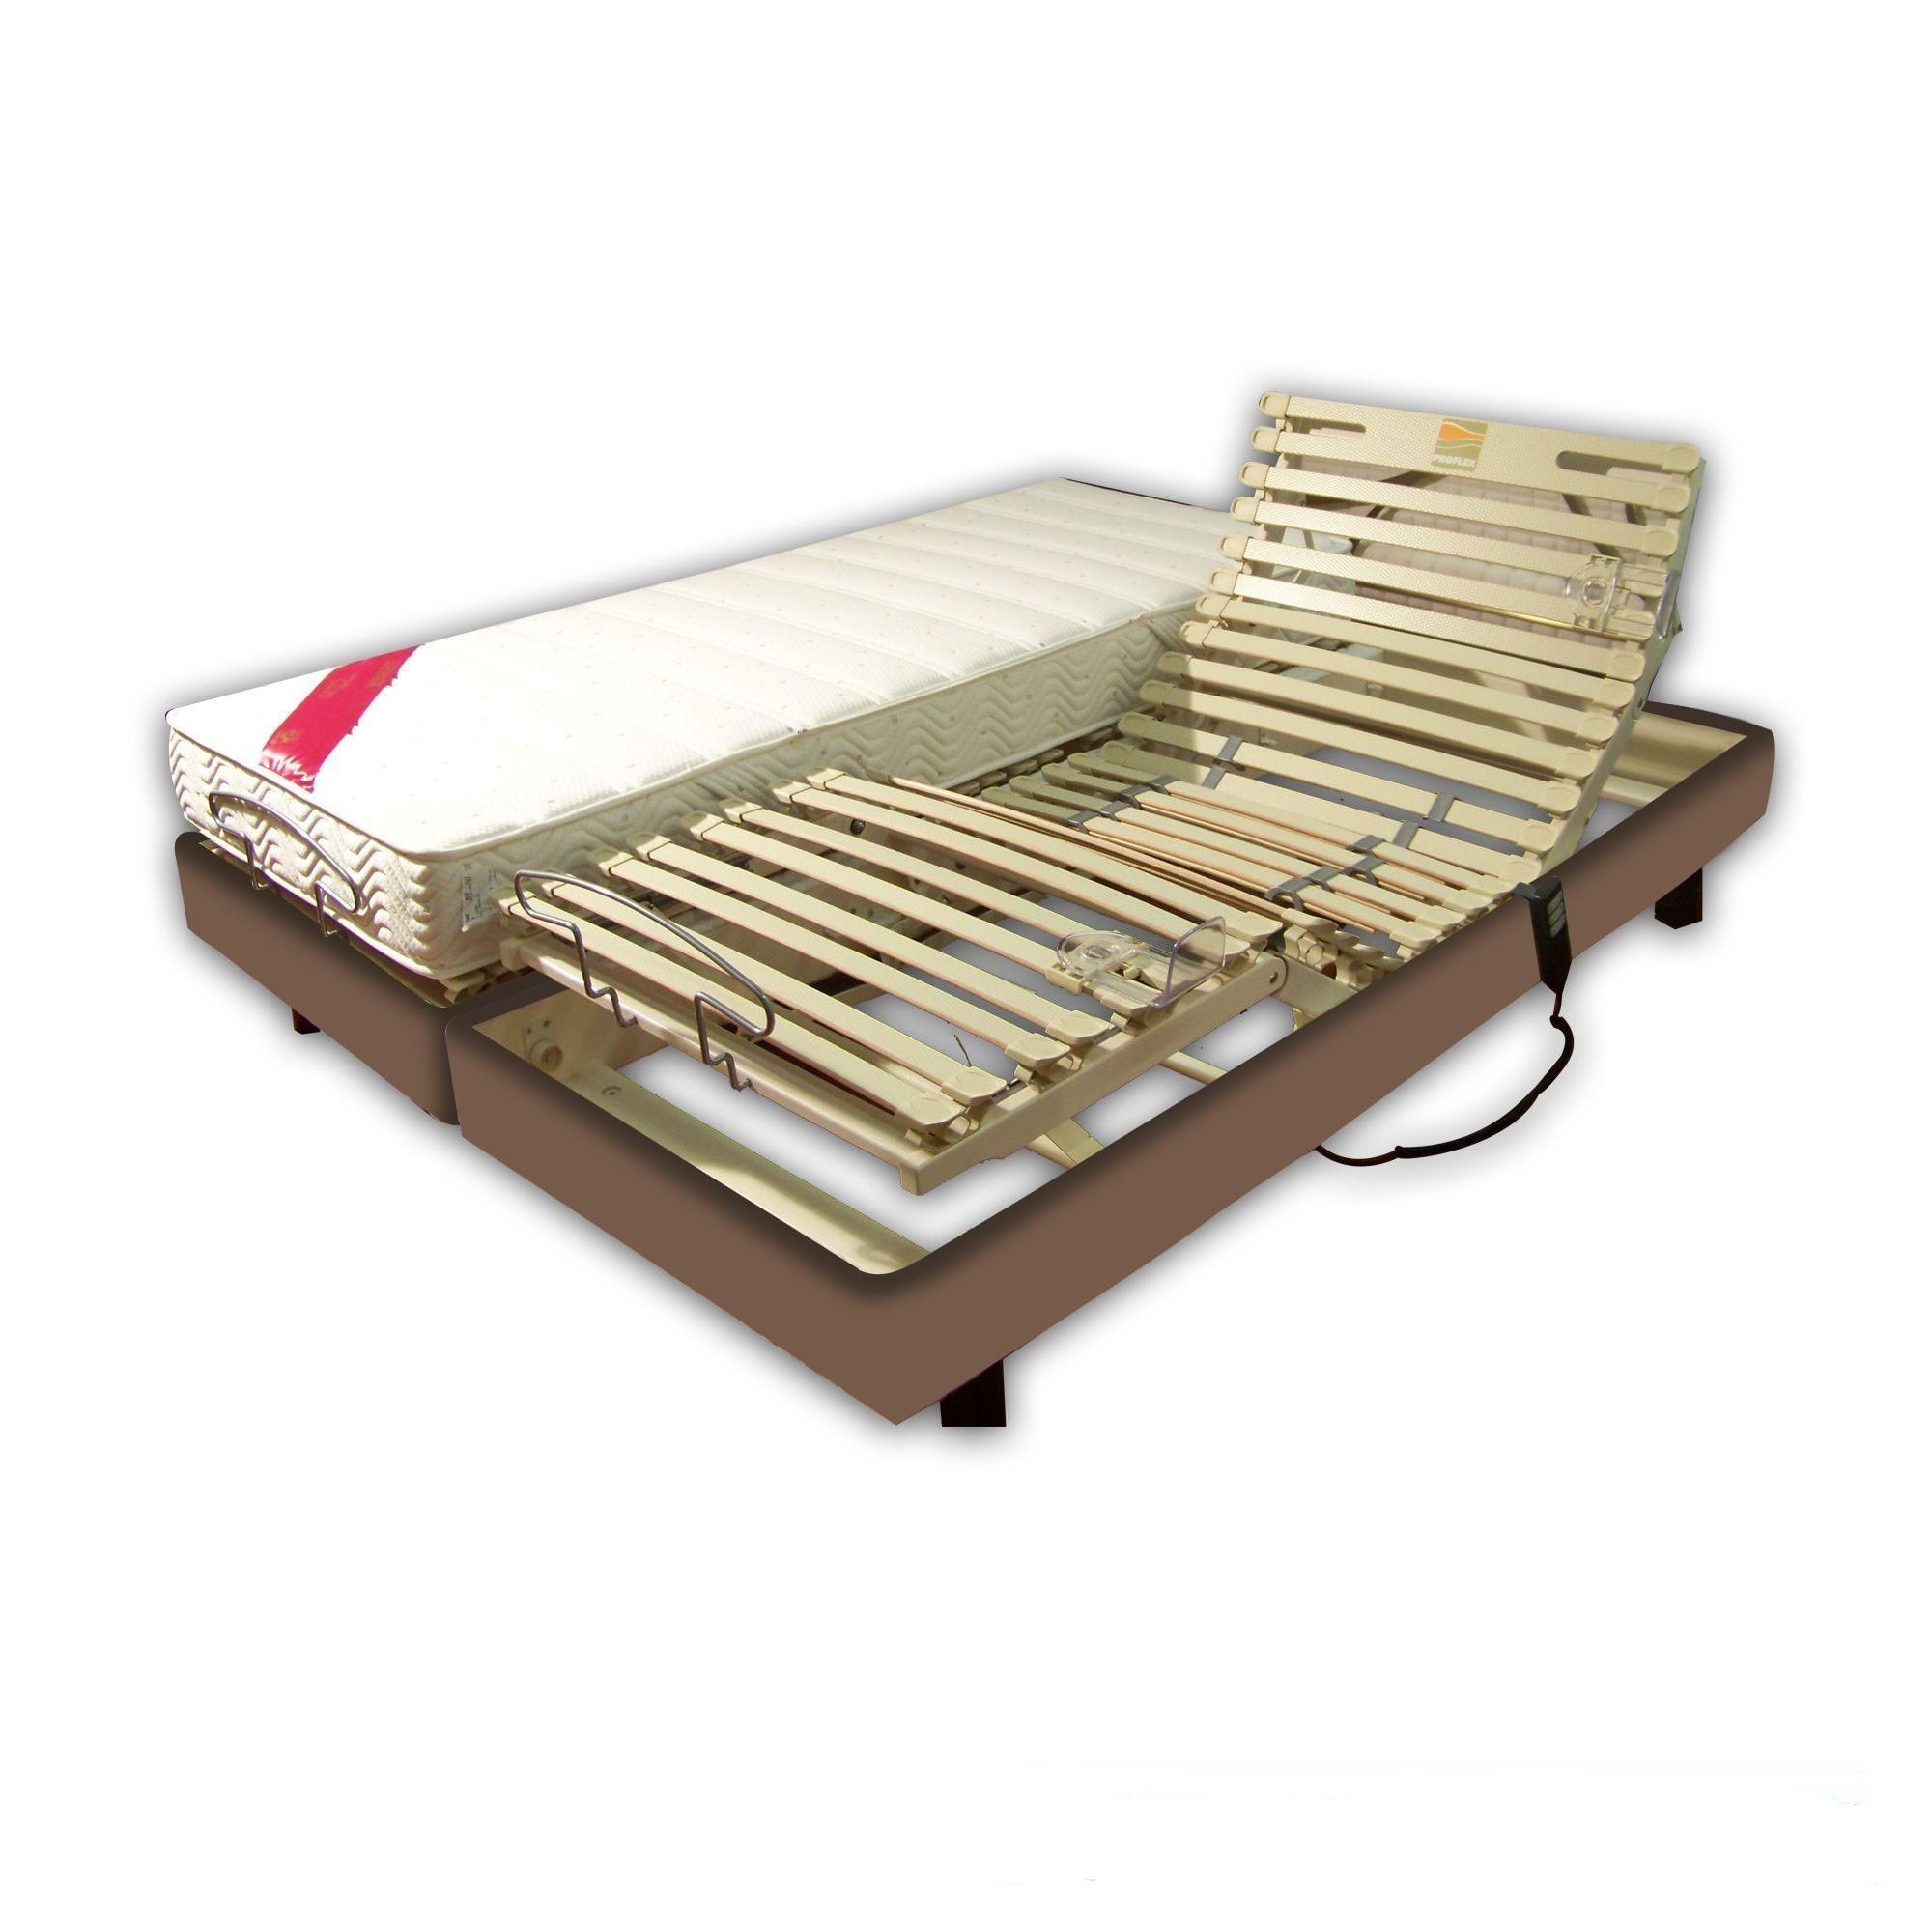 vente ensemble relaxation latex 2x80x200 clips simili cuir taupe pas cher avenue literie. Black Bedroom Furniture Sets. Home Design Ideas